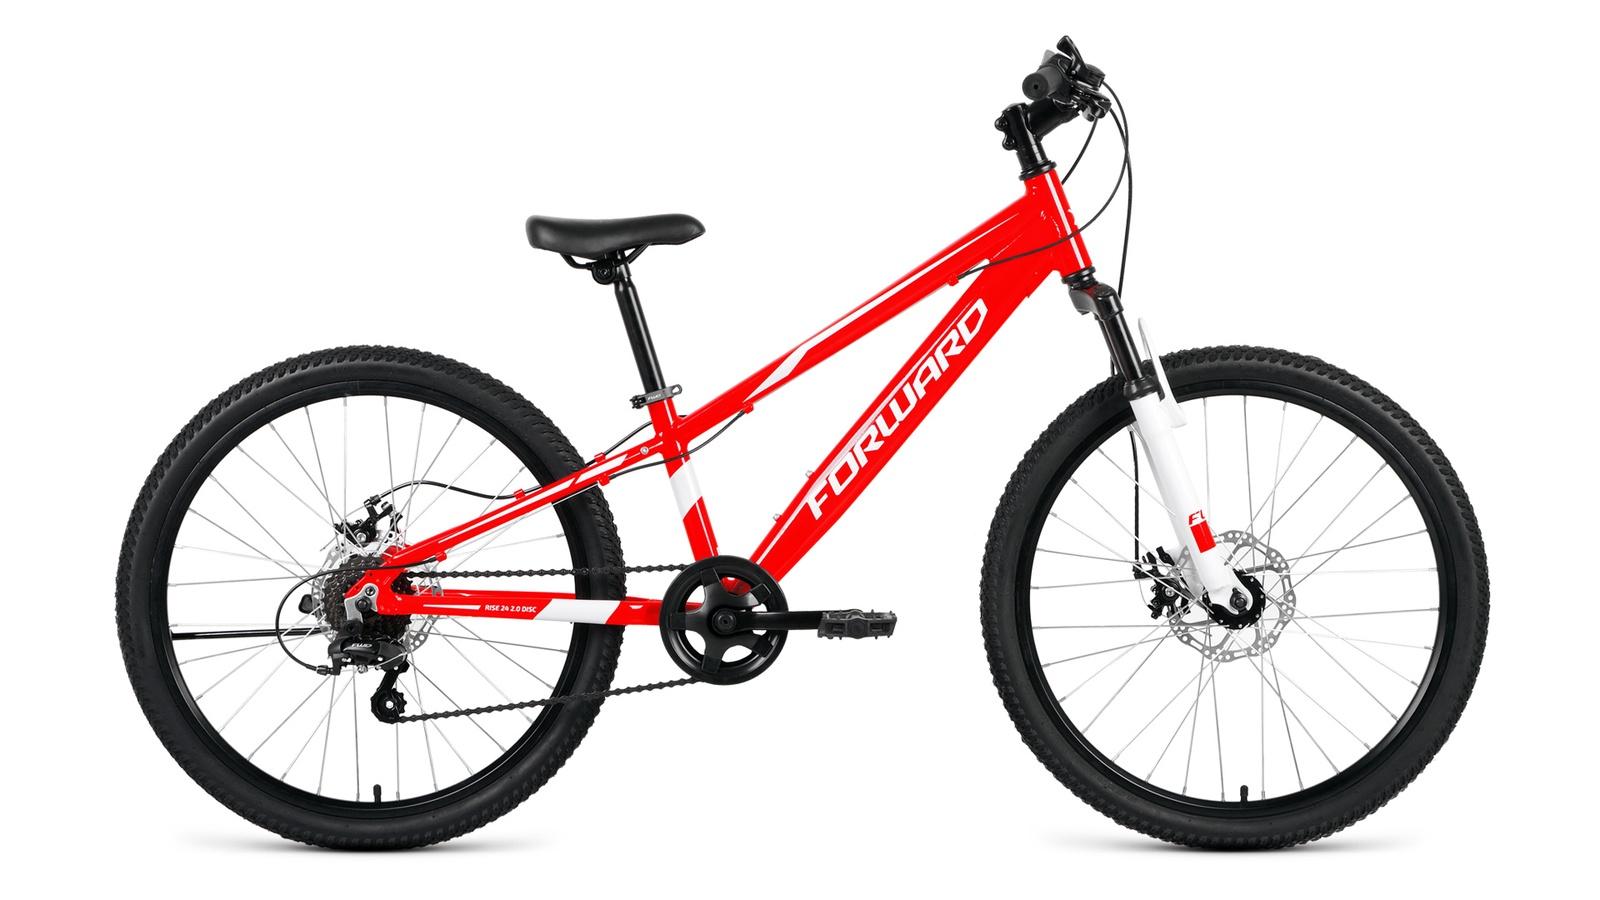 Велосипед Forward Rise 24 2.0 disc, красный, белый велосипед giant rove disc lite 2016